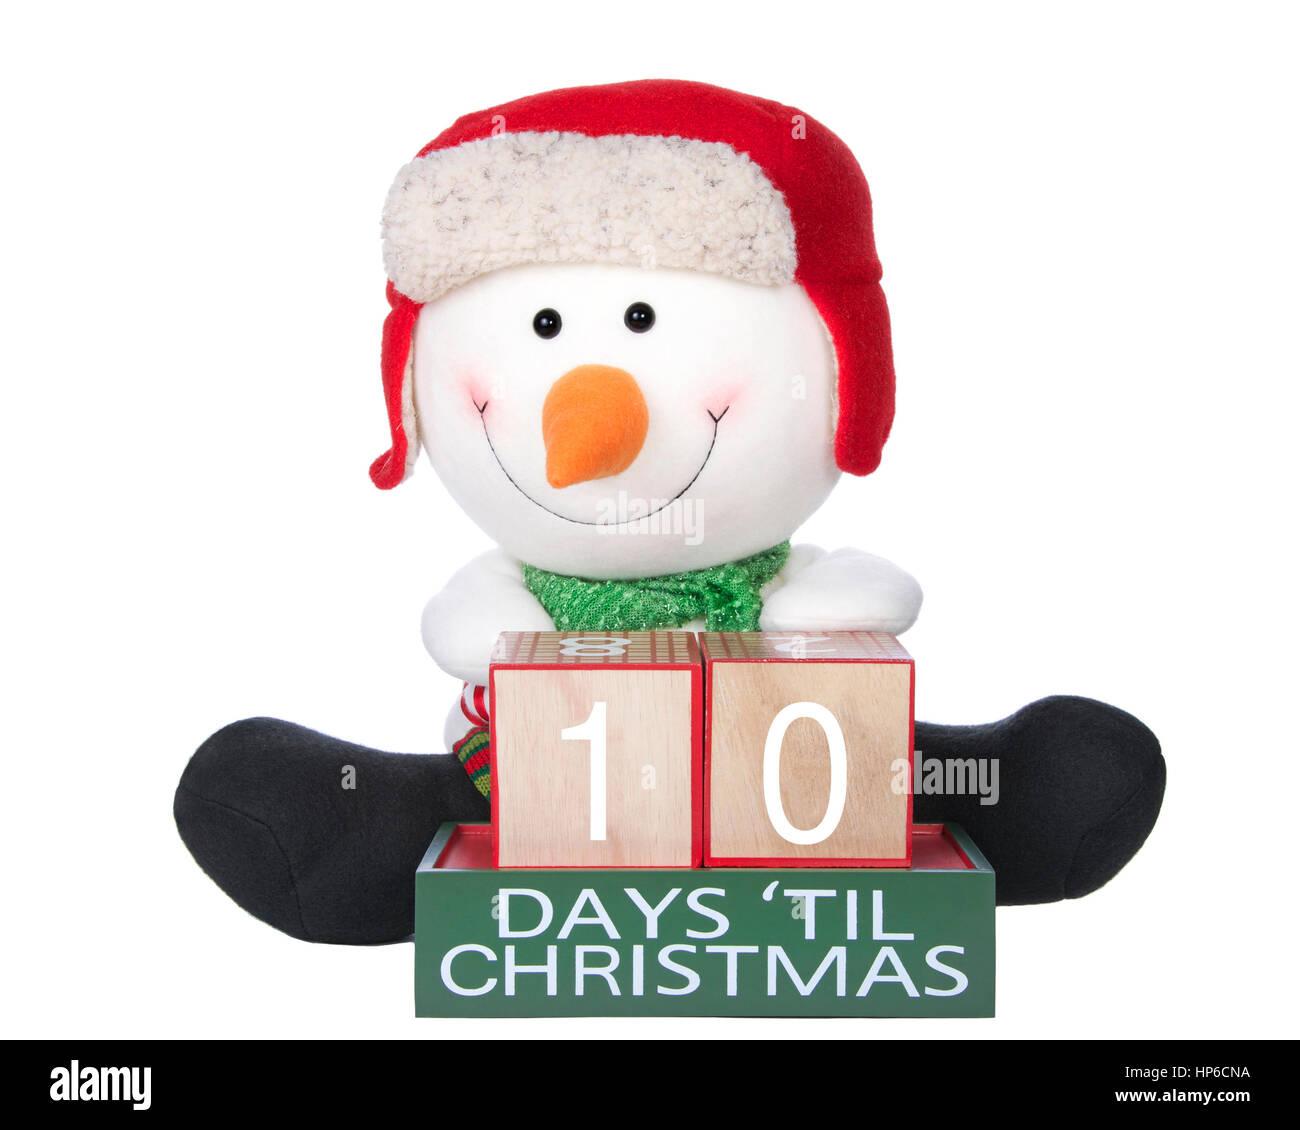 Until Christmas 10 Weeks Till Christmas.10 Days Until Christmas Light Beech Wood Blocks With Snowman